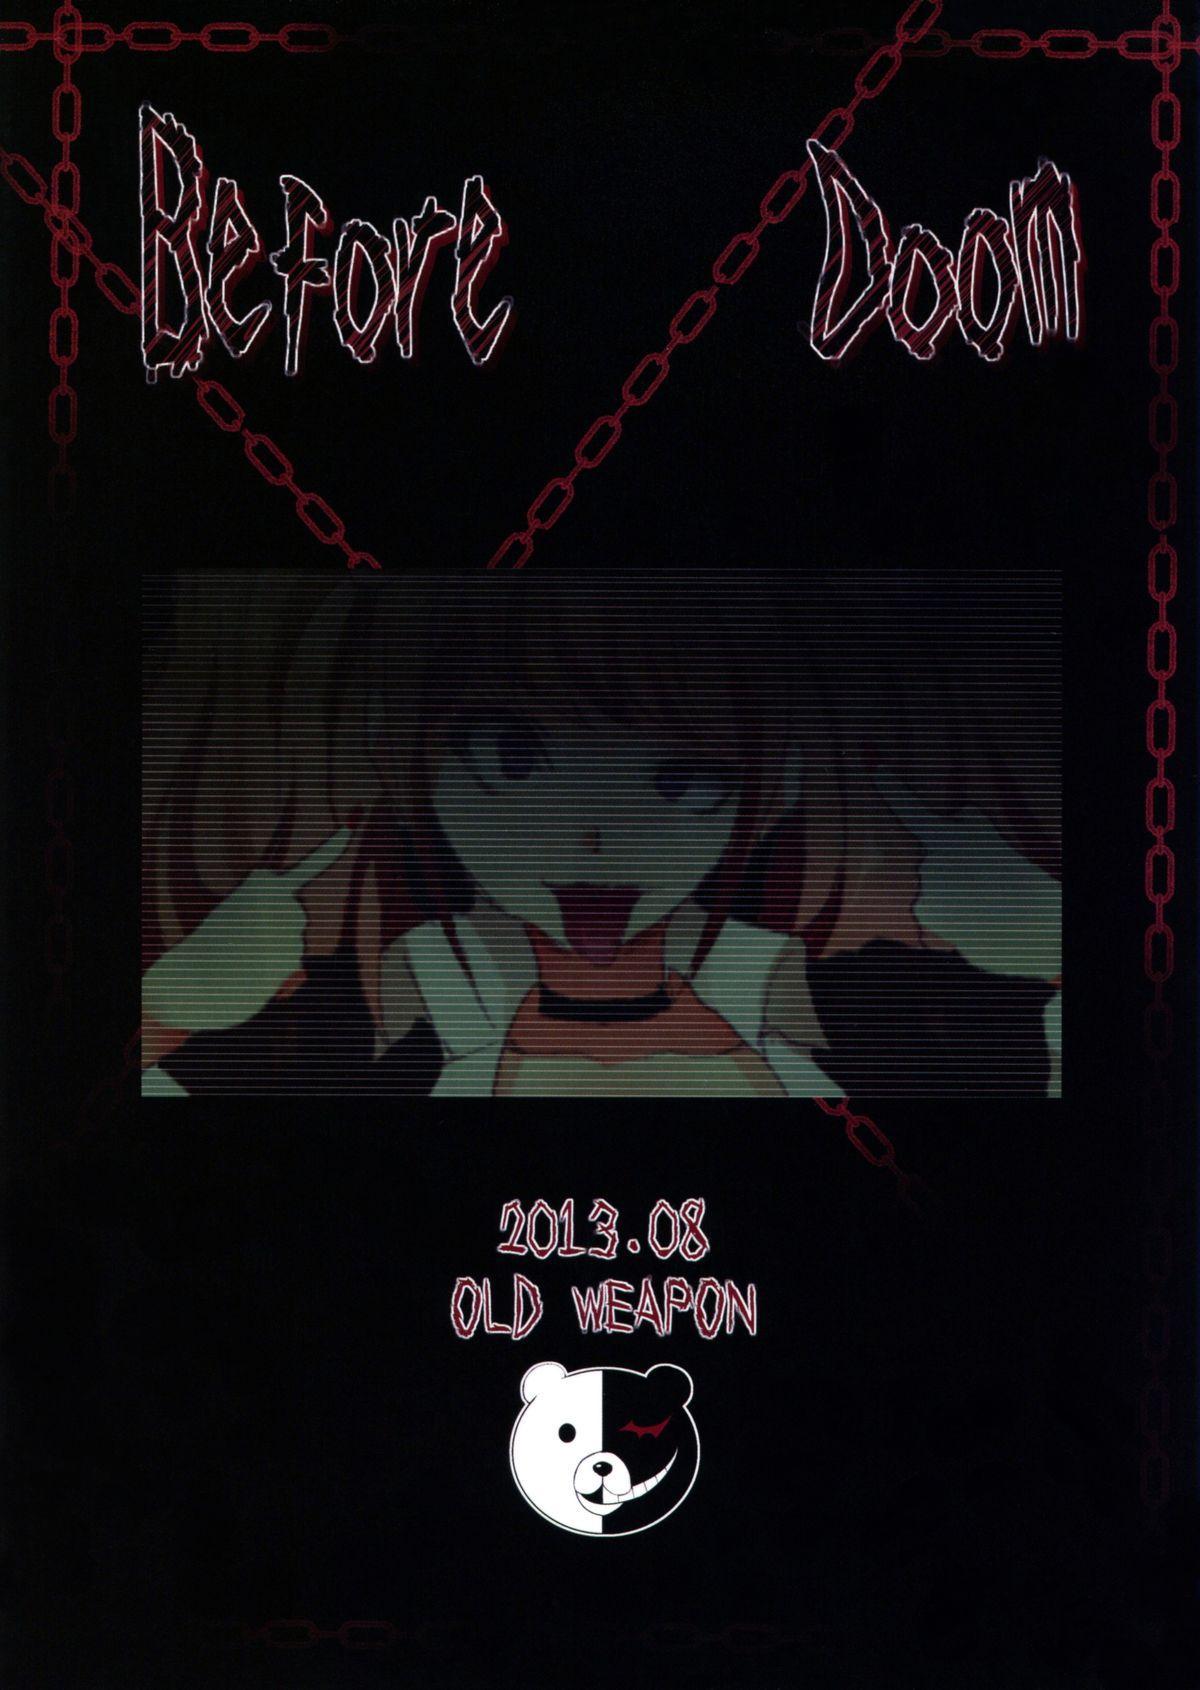 Before Doom 24